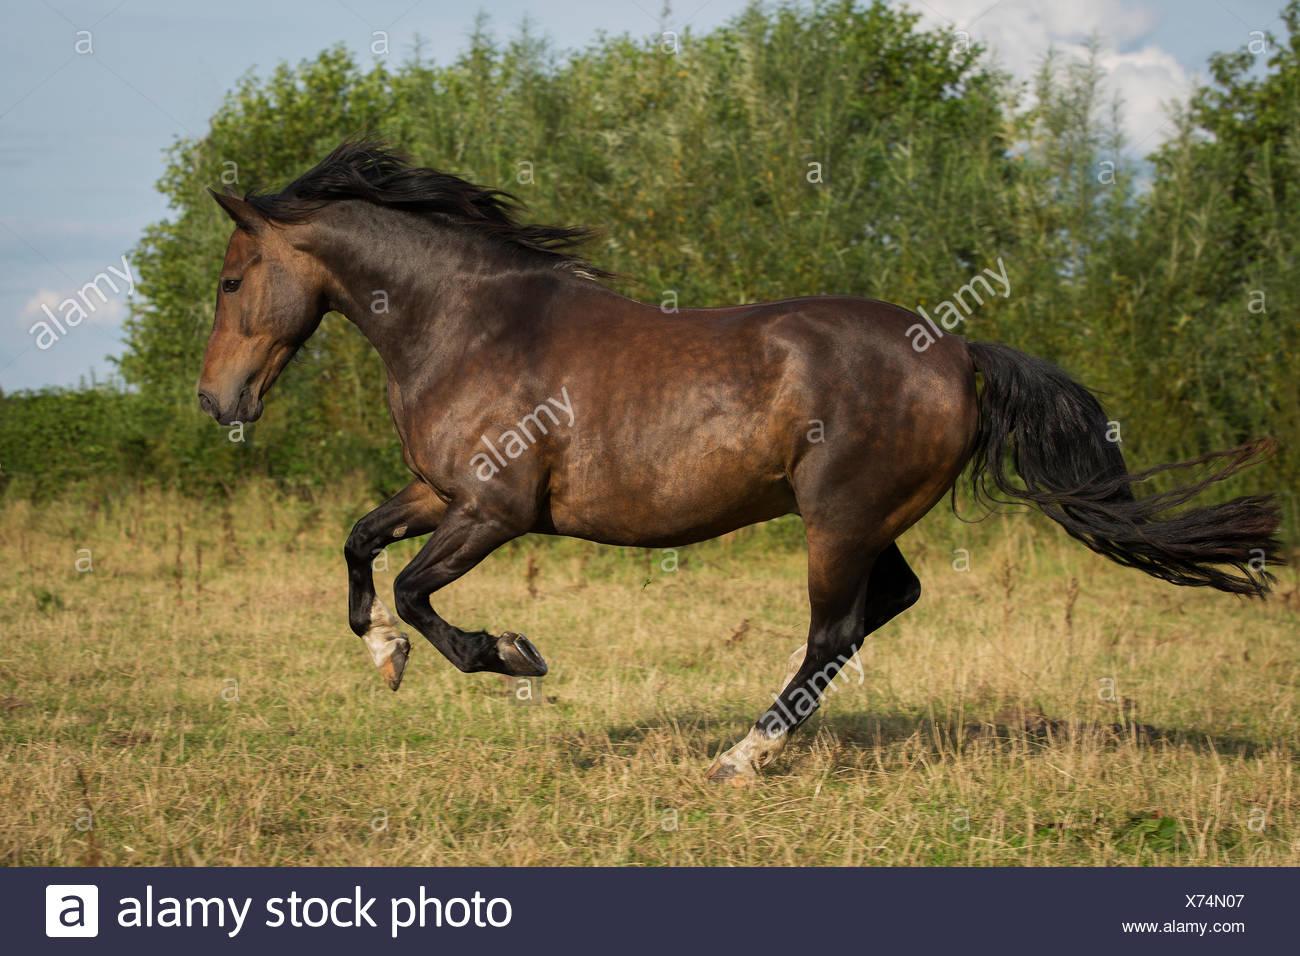 Spanish stallion galloping, Tyrol, Austria - Stock Image